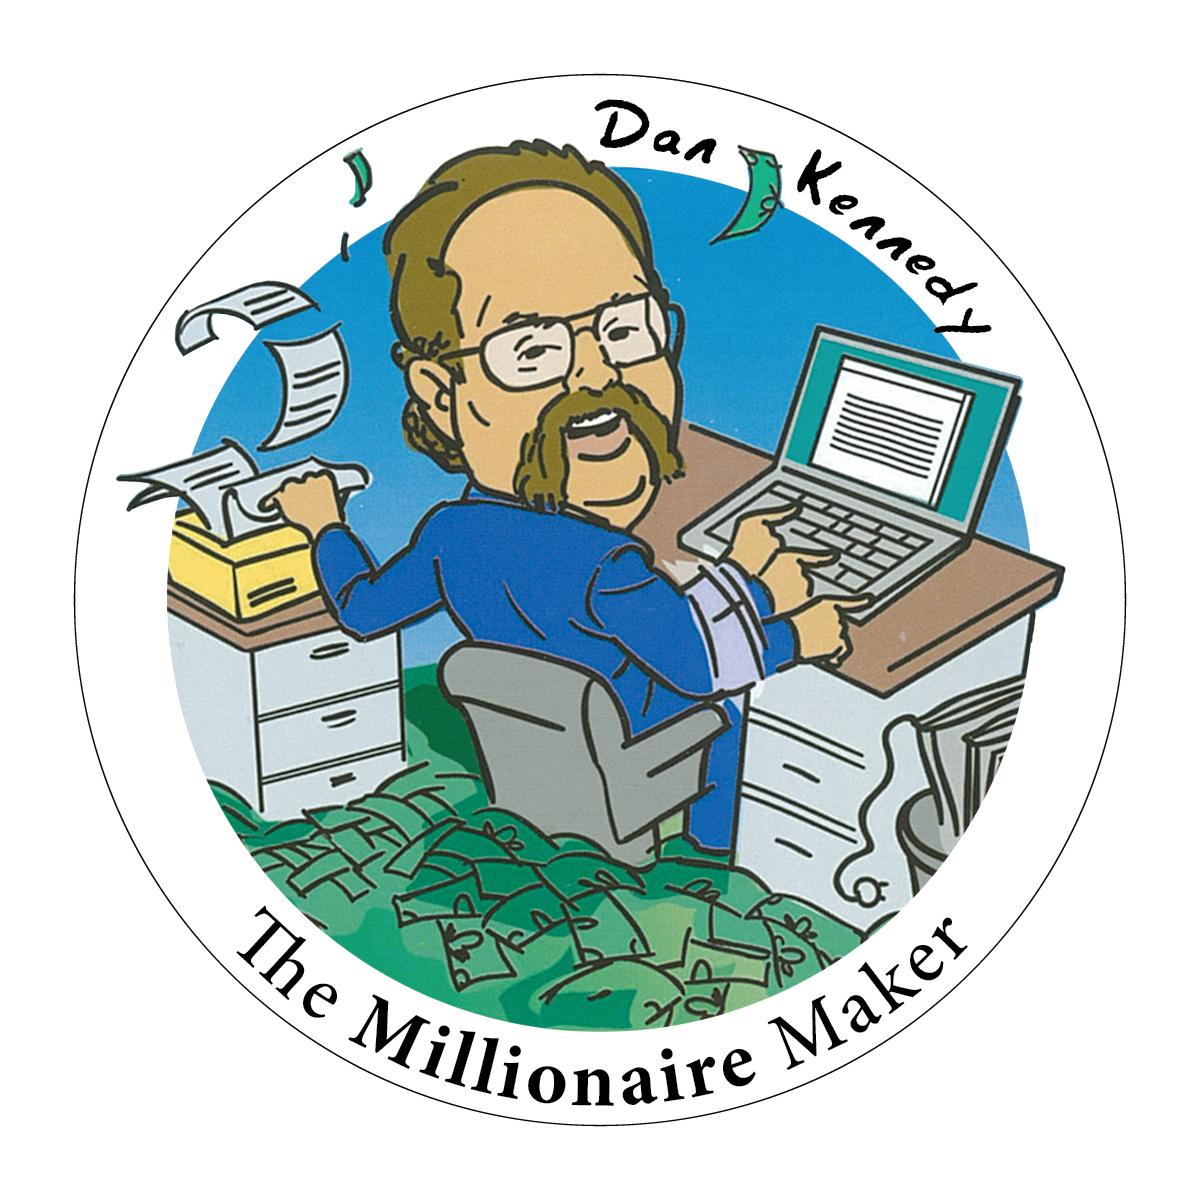 Dan Kennedy The Millionaire Maker